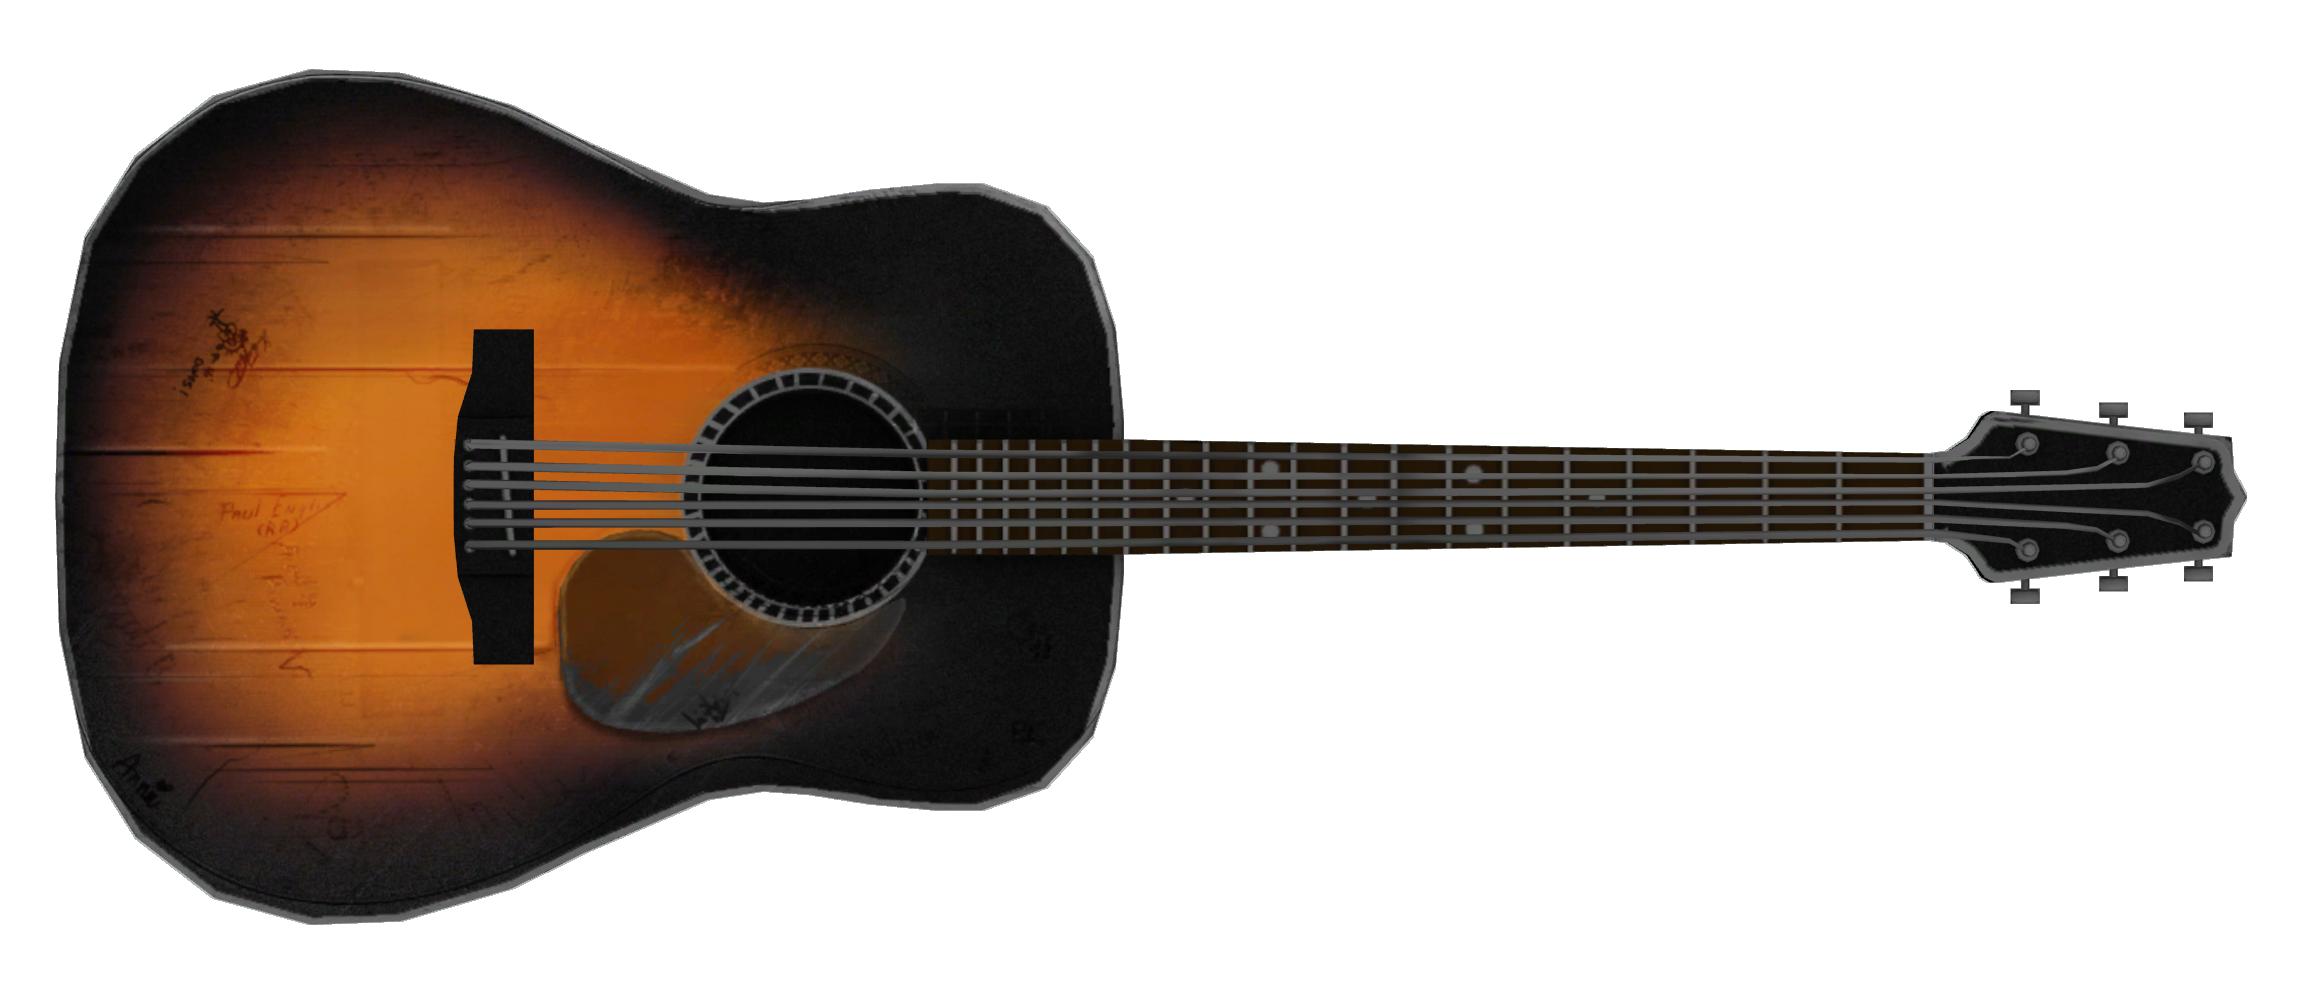 Acoustic Guitar Fallout New Vegas Fallout Wiki Fandom